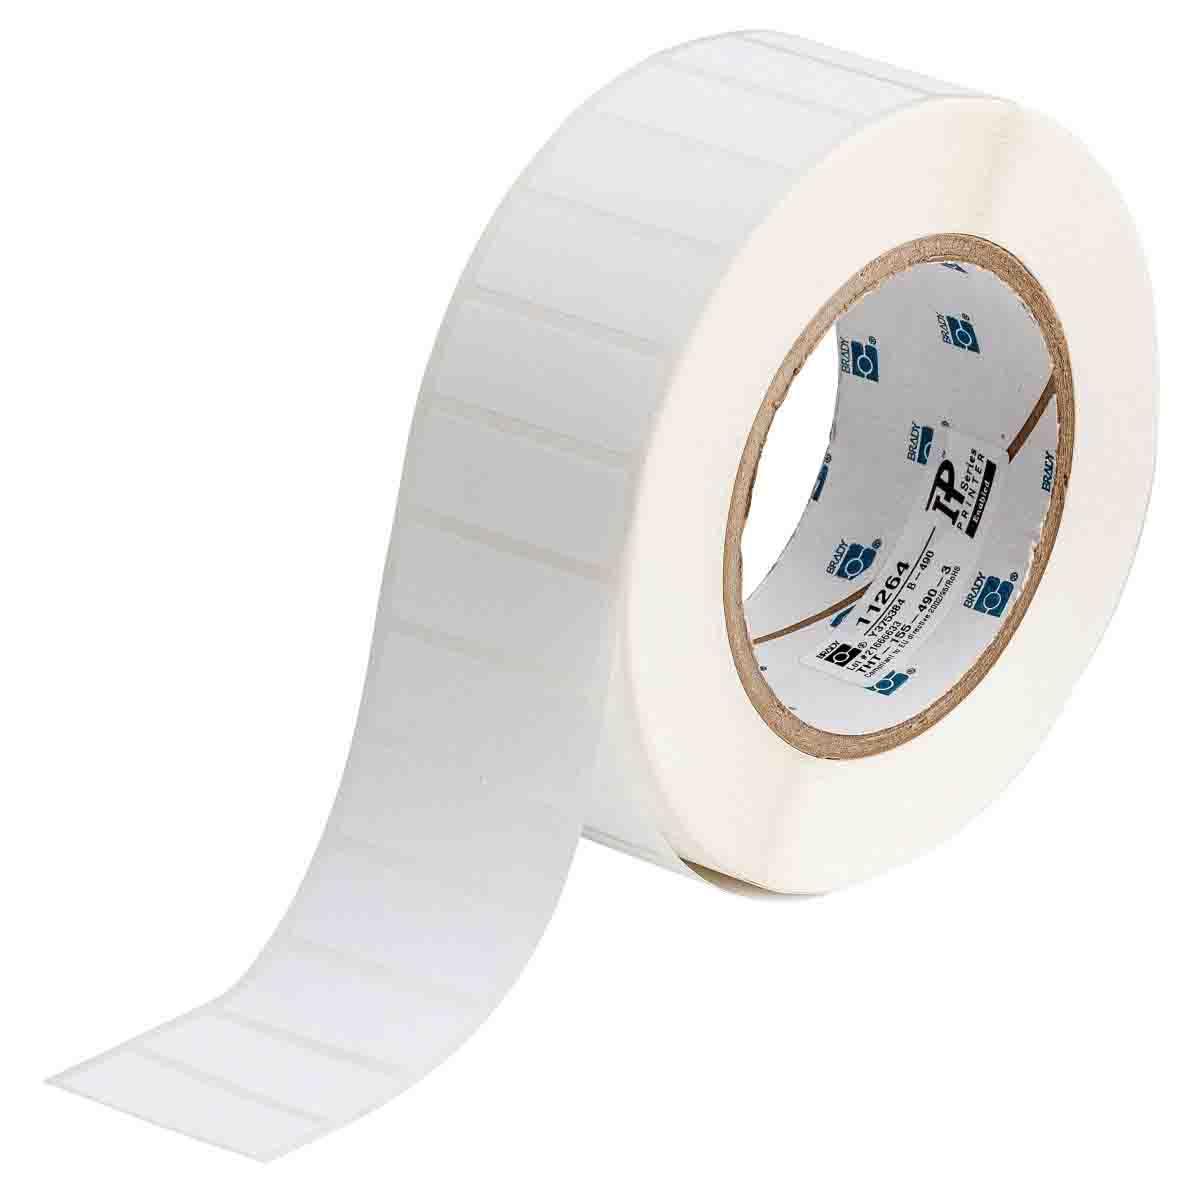 White 0.650 Width x 0.200 Height Brady THT-14-498-5-SC Thermal Transfer Printer Labels